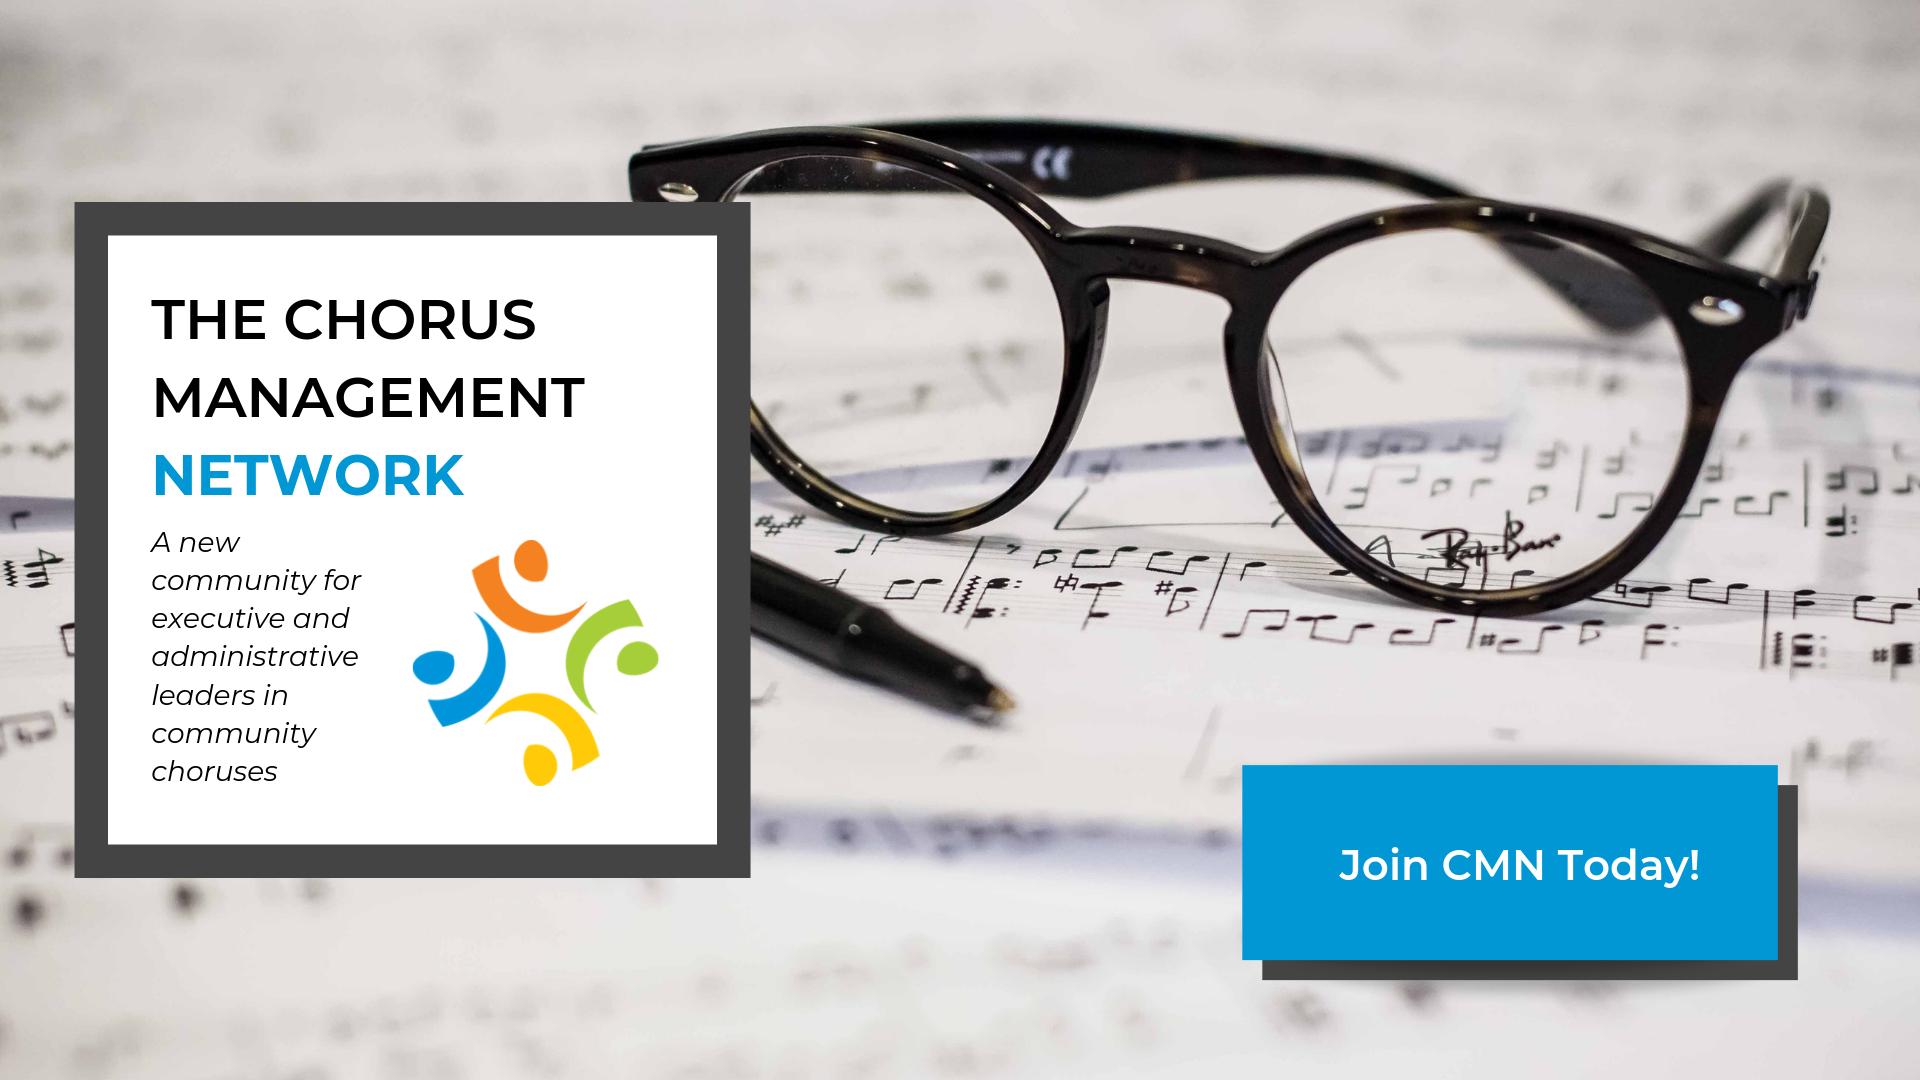 The Chorus Management Network